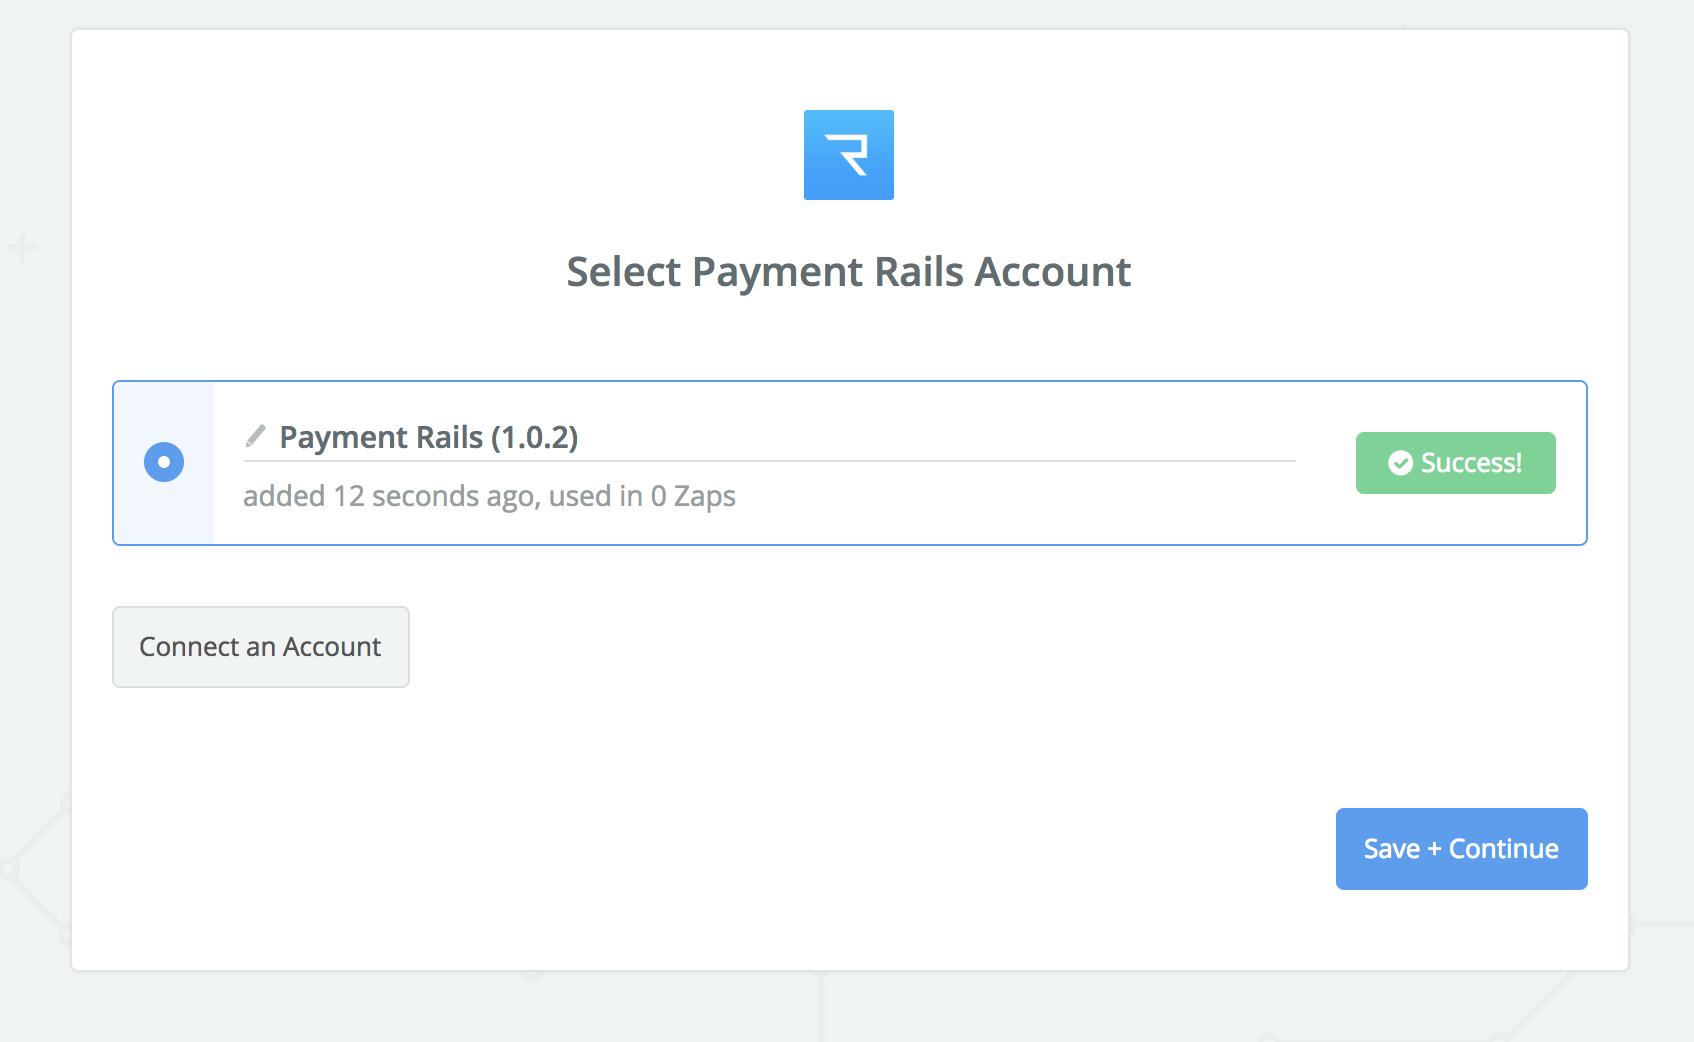 Payment Rails connection successful